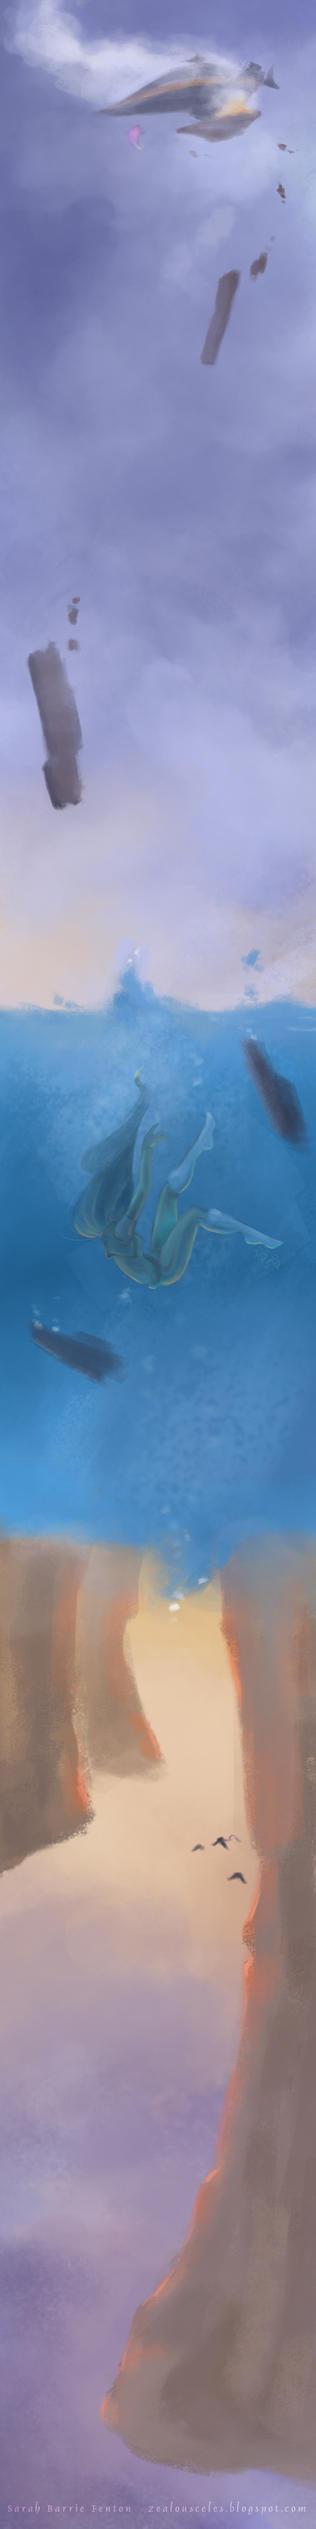 Into the ocean end it all... by zealousceles